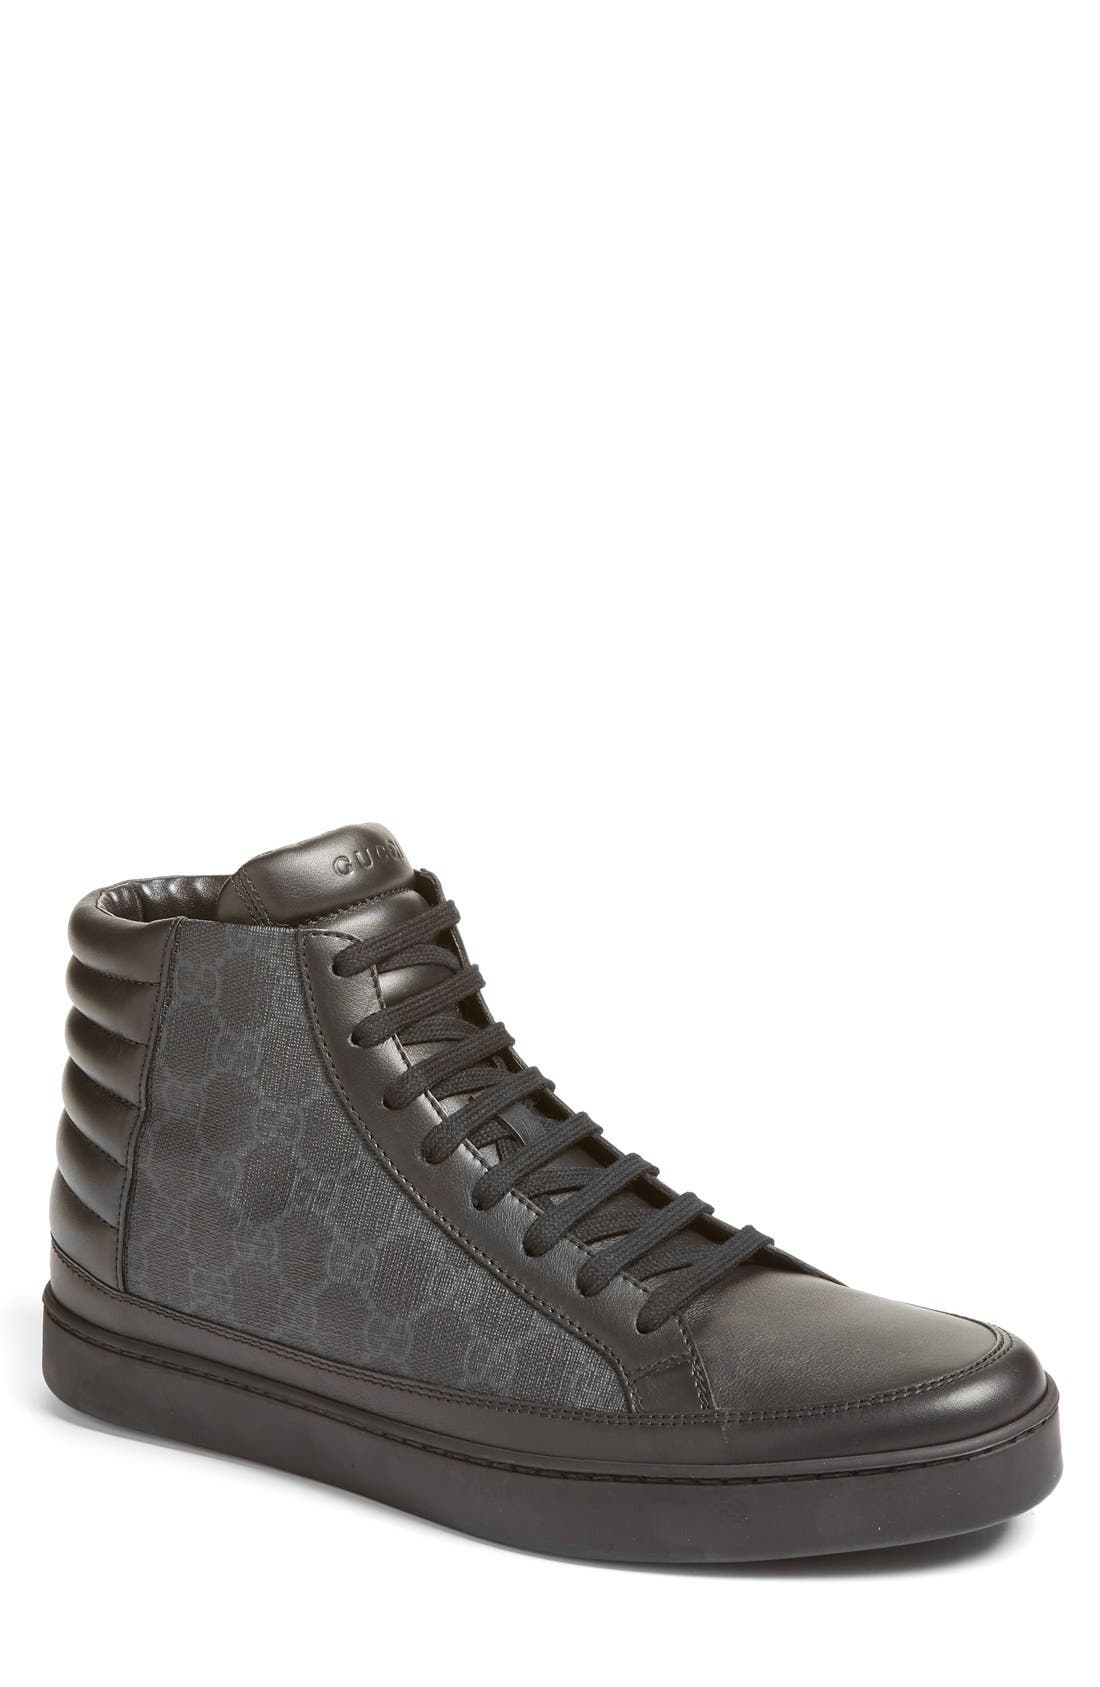 Main Image - Gucci 'Common' High Top Sneaker (Men)